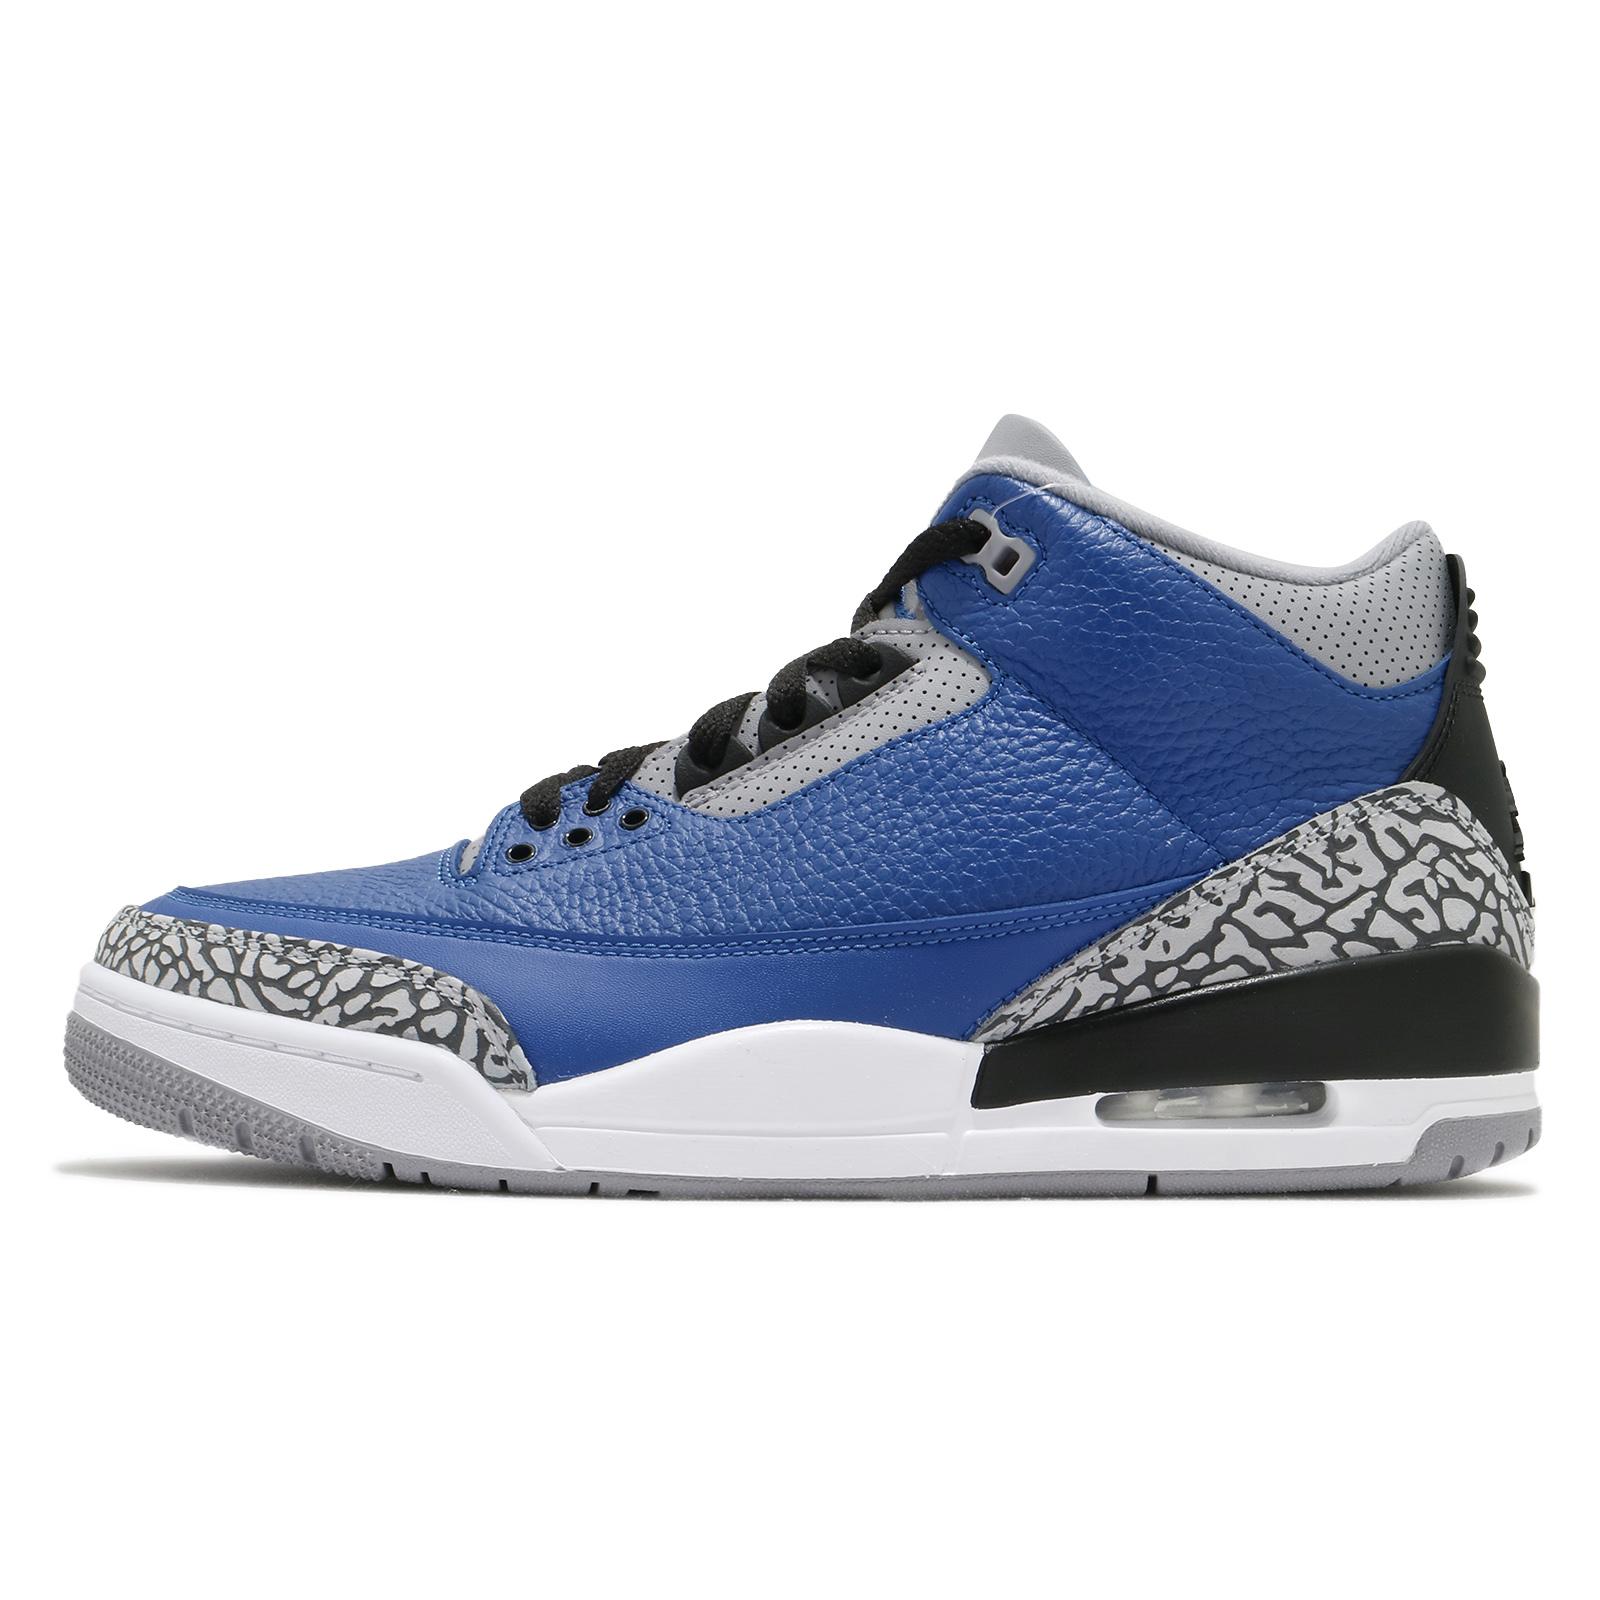 Nike Air Jordan 3 Retro 藍 黑 爆裂紋 喬丹 3代 男鞋 【ACS】 CT8532-400